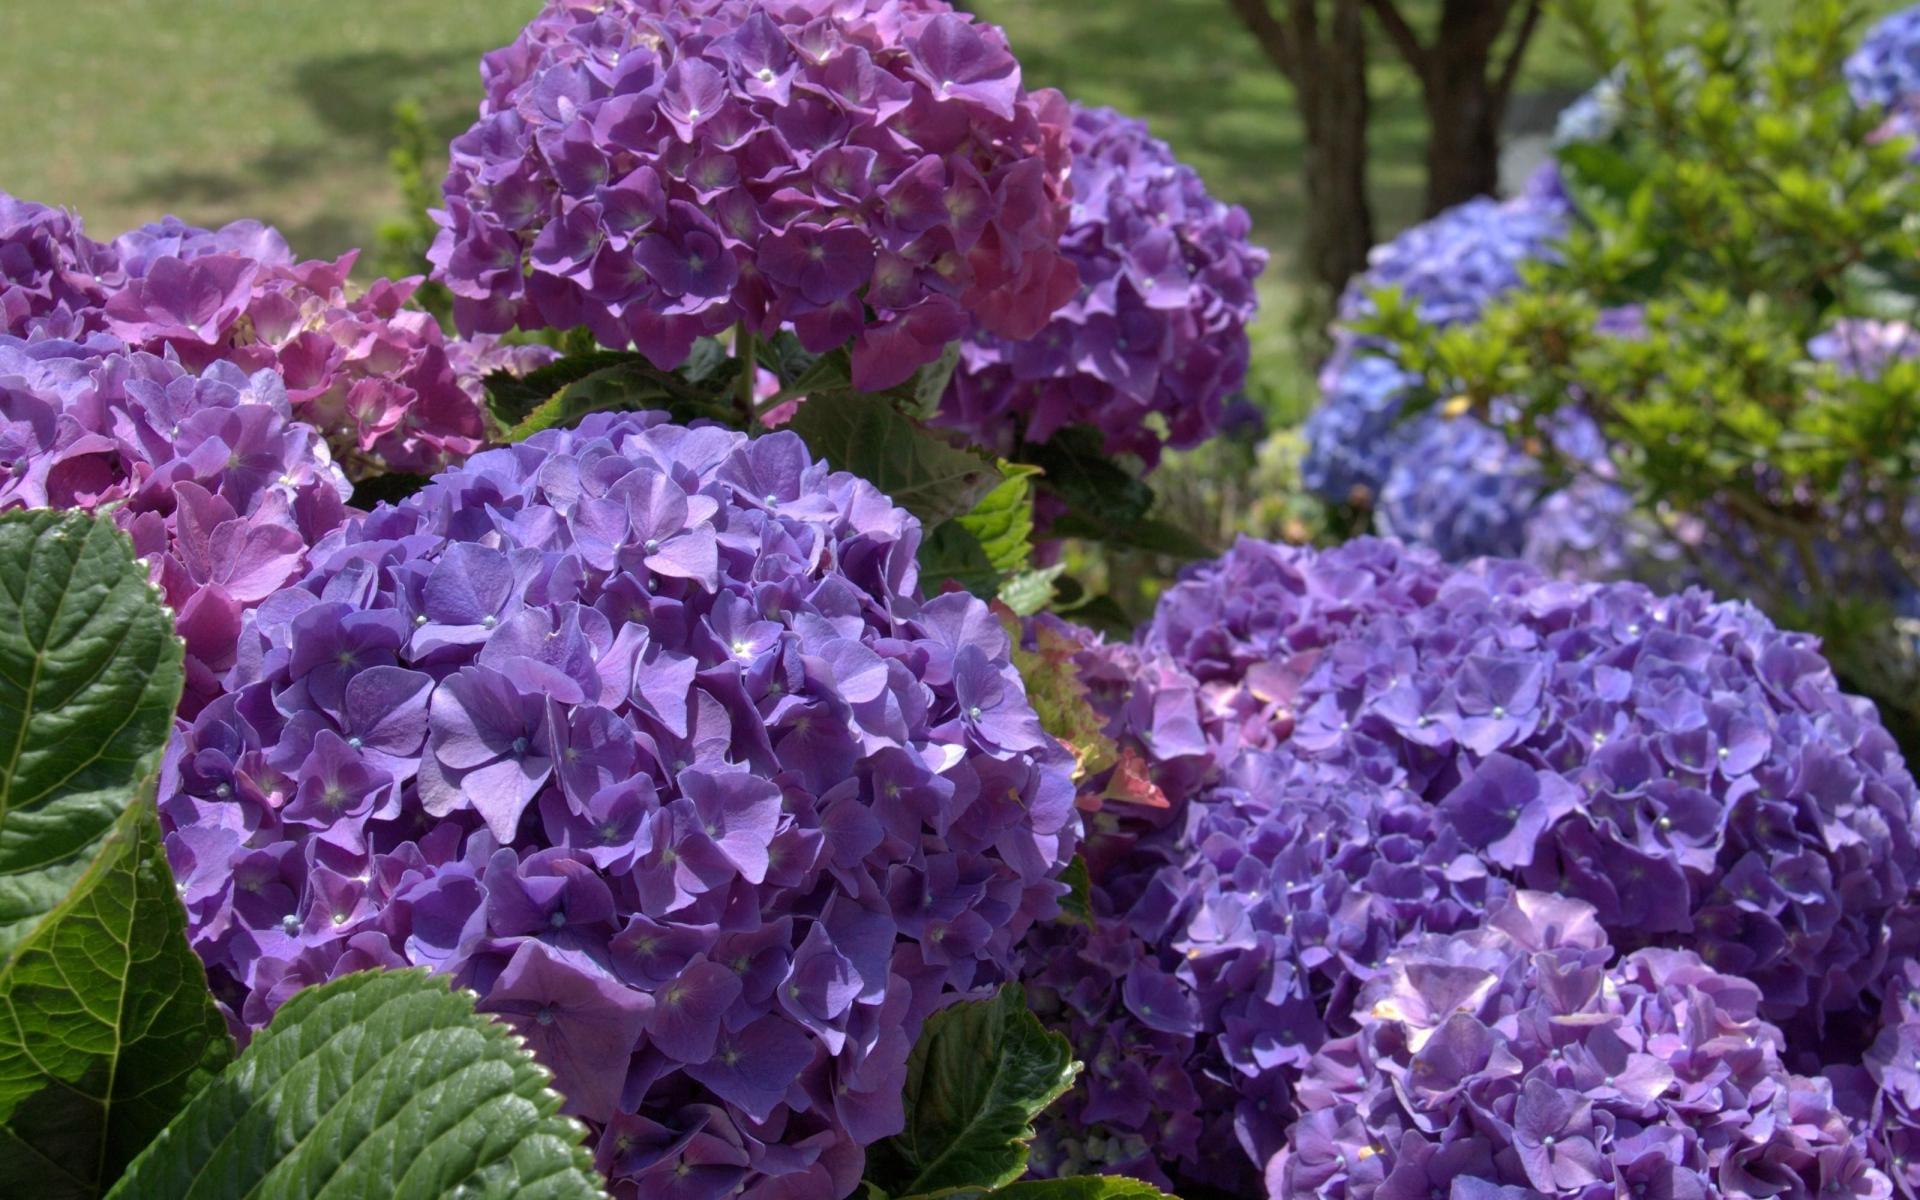 Violet Flower Hd Wallpaper Hydrangea Flowers Wallpapers Archives Hdwallsource Com